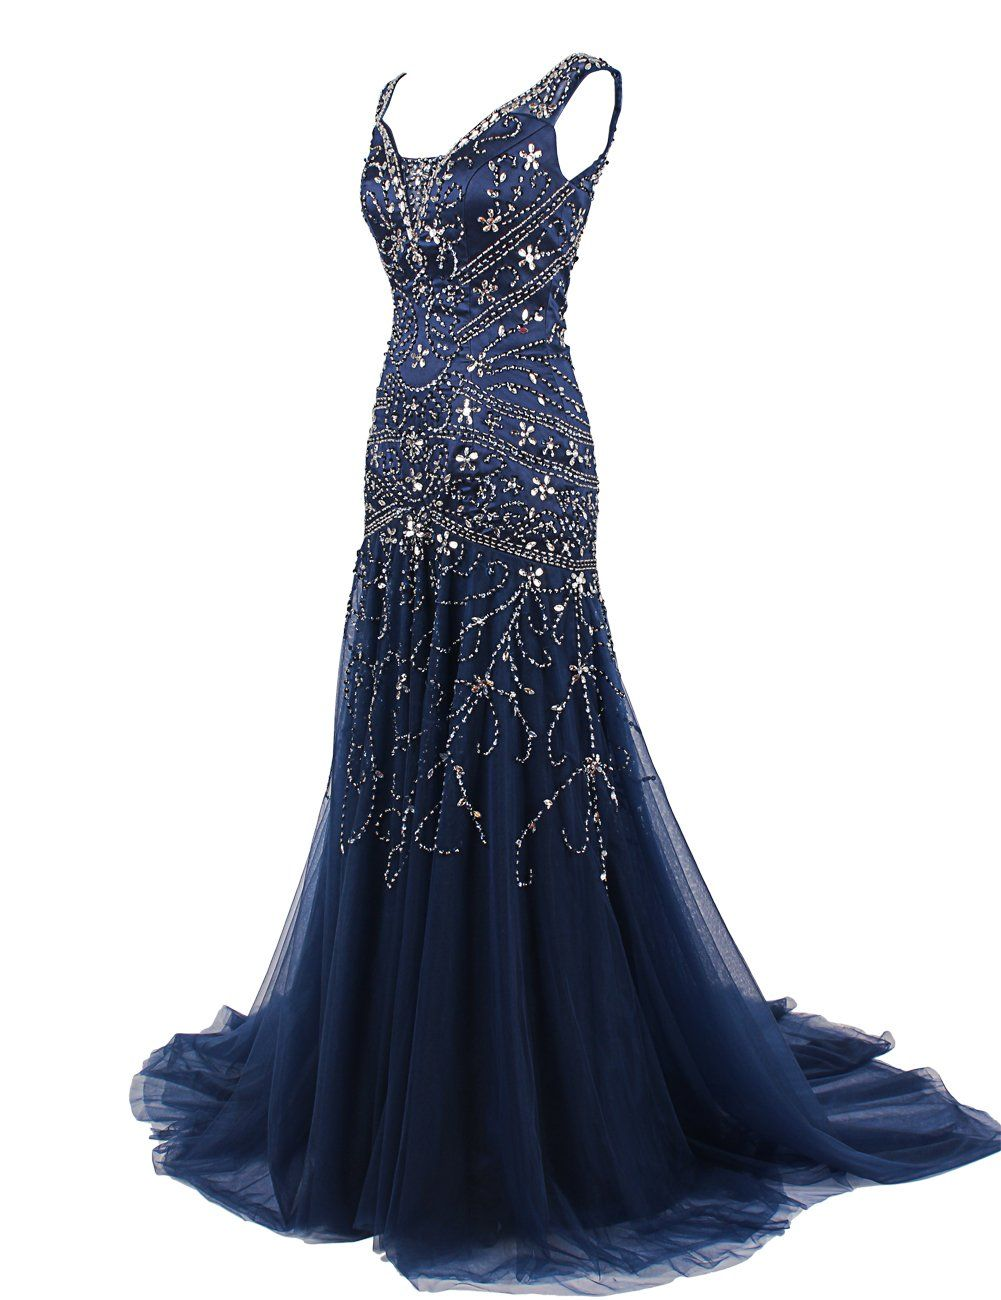 Dressystar mermaid beaded straps wedding prom evening dresses with